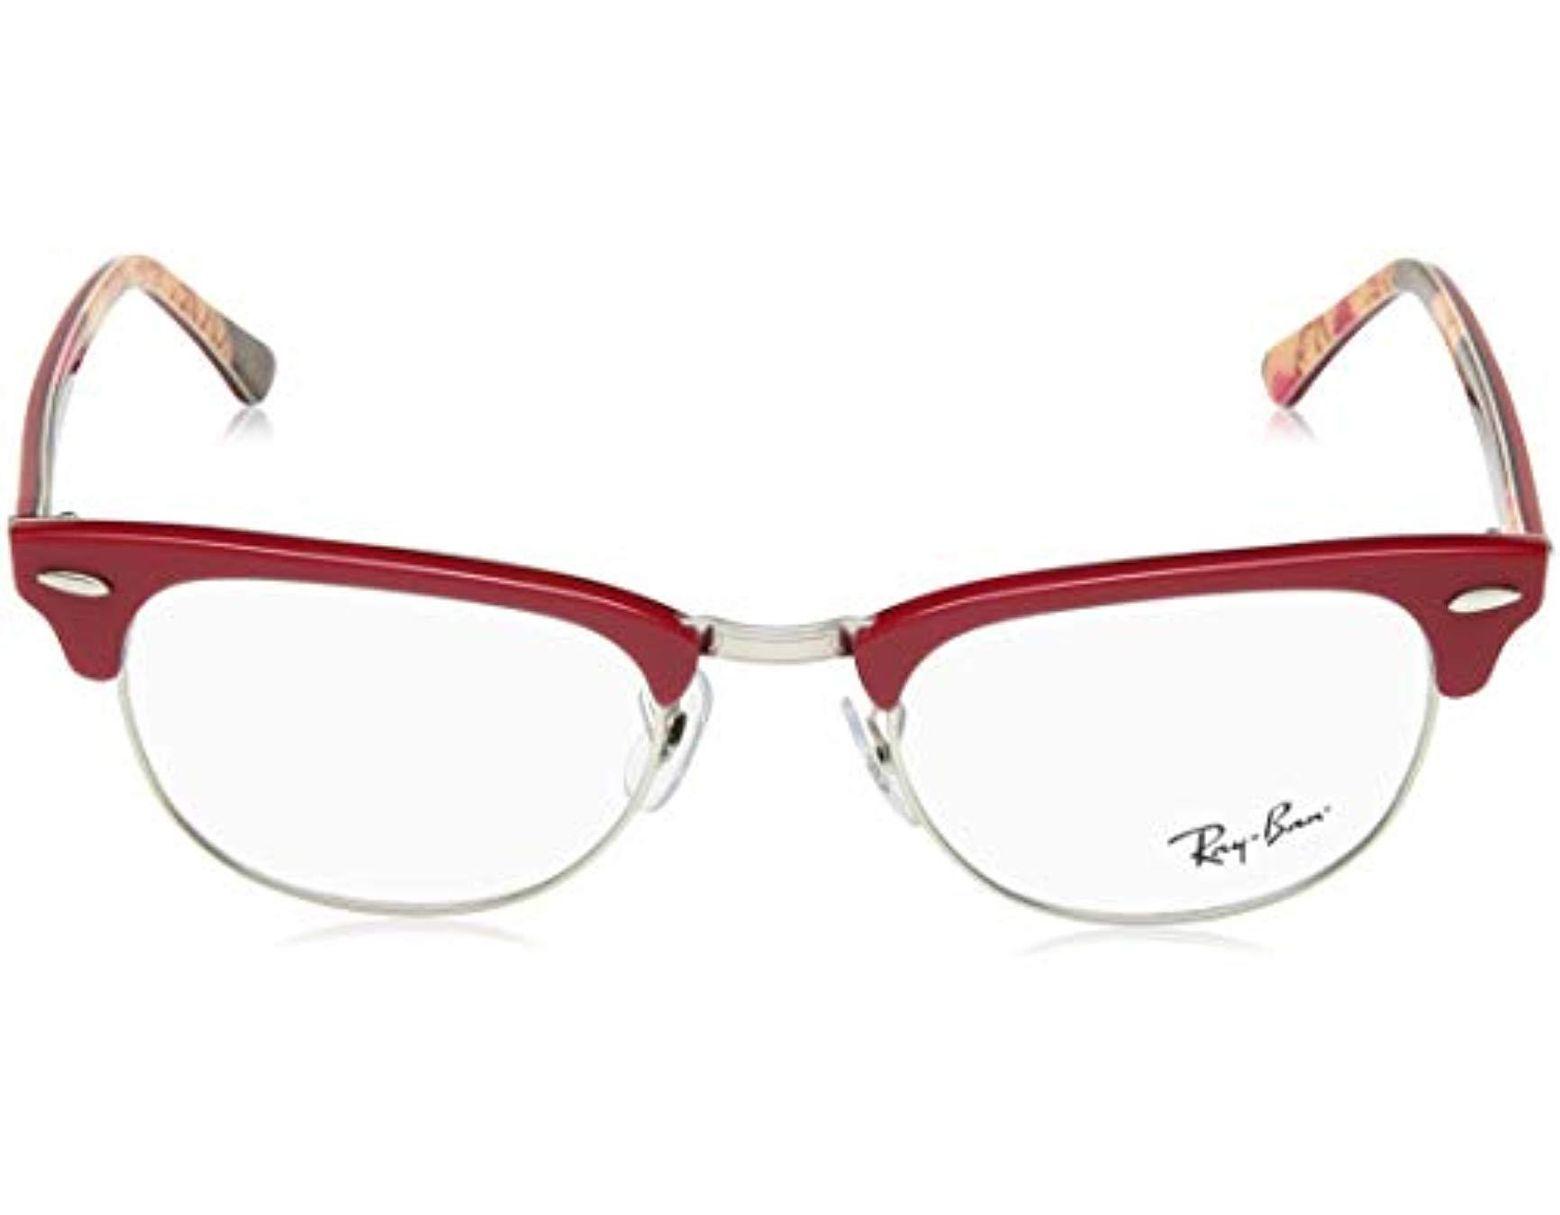 6a8a191085 Clubmaster, Monturas de Gafas Unisex Adulto Ray-Ban de hombre de color Rojo  - Lyst